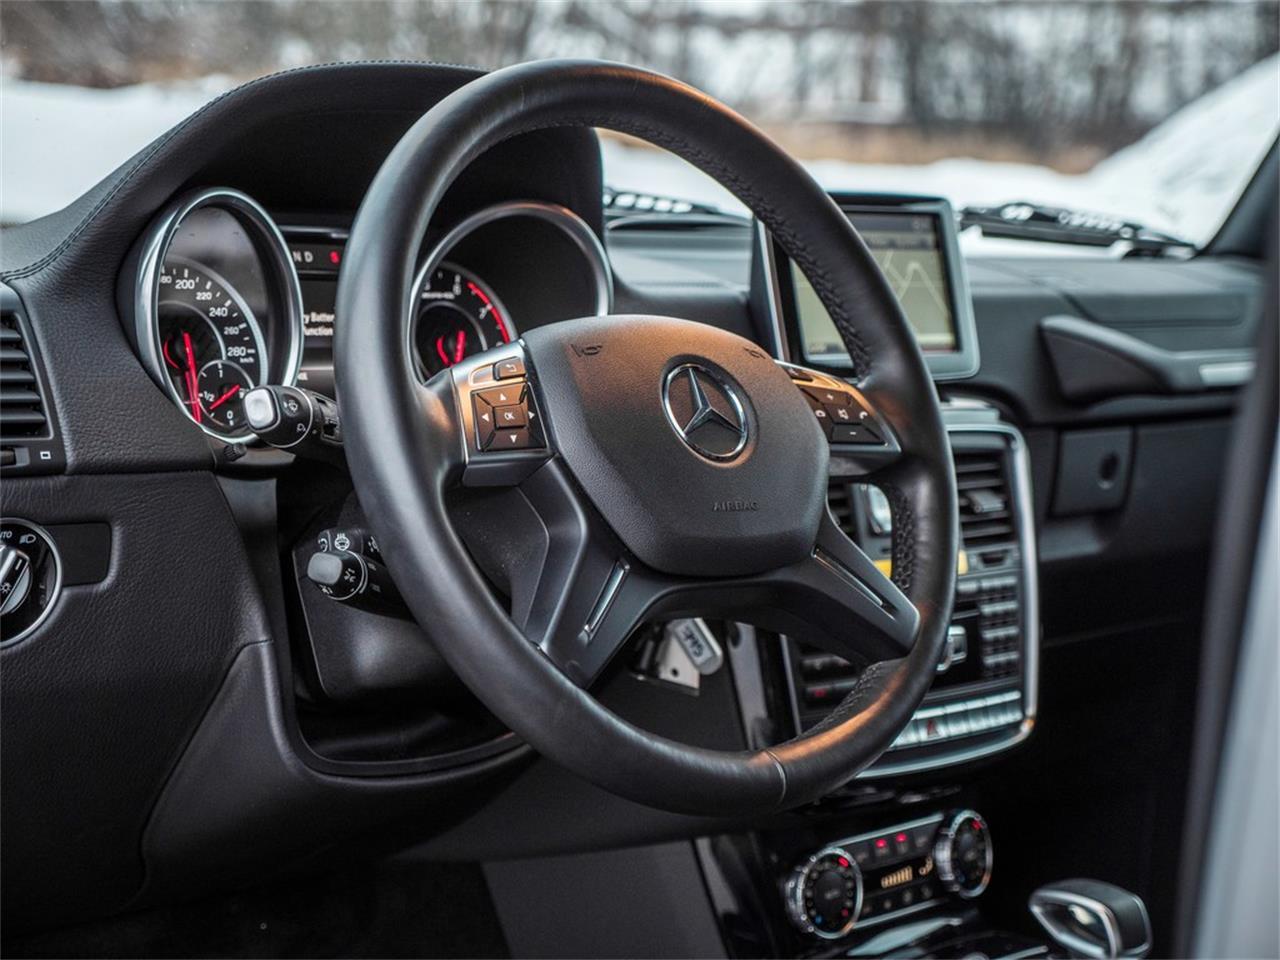 2016 Mercedes-Benz G-Class (CC-1235288) for sale in Kelowna, British Columbia